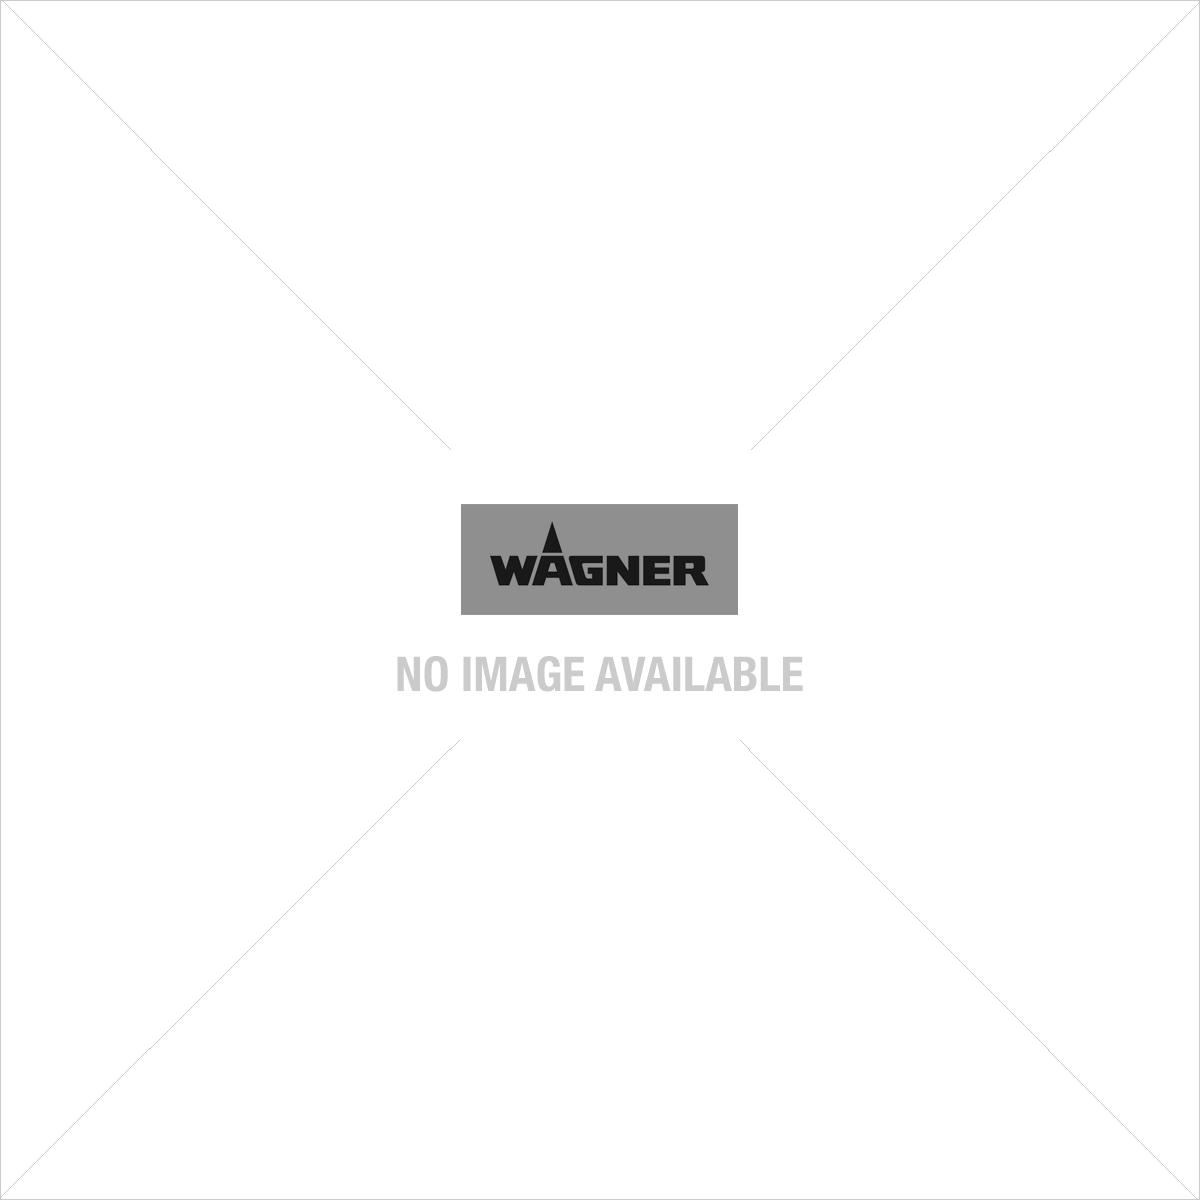 Pomp herstelkit PP 119 Wagner project pro 119